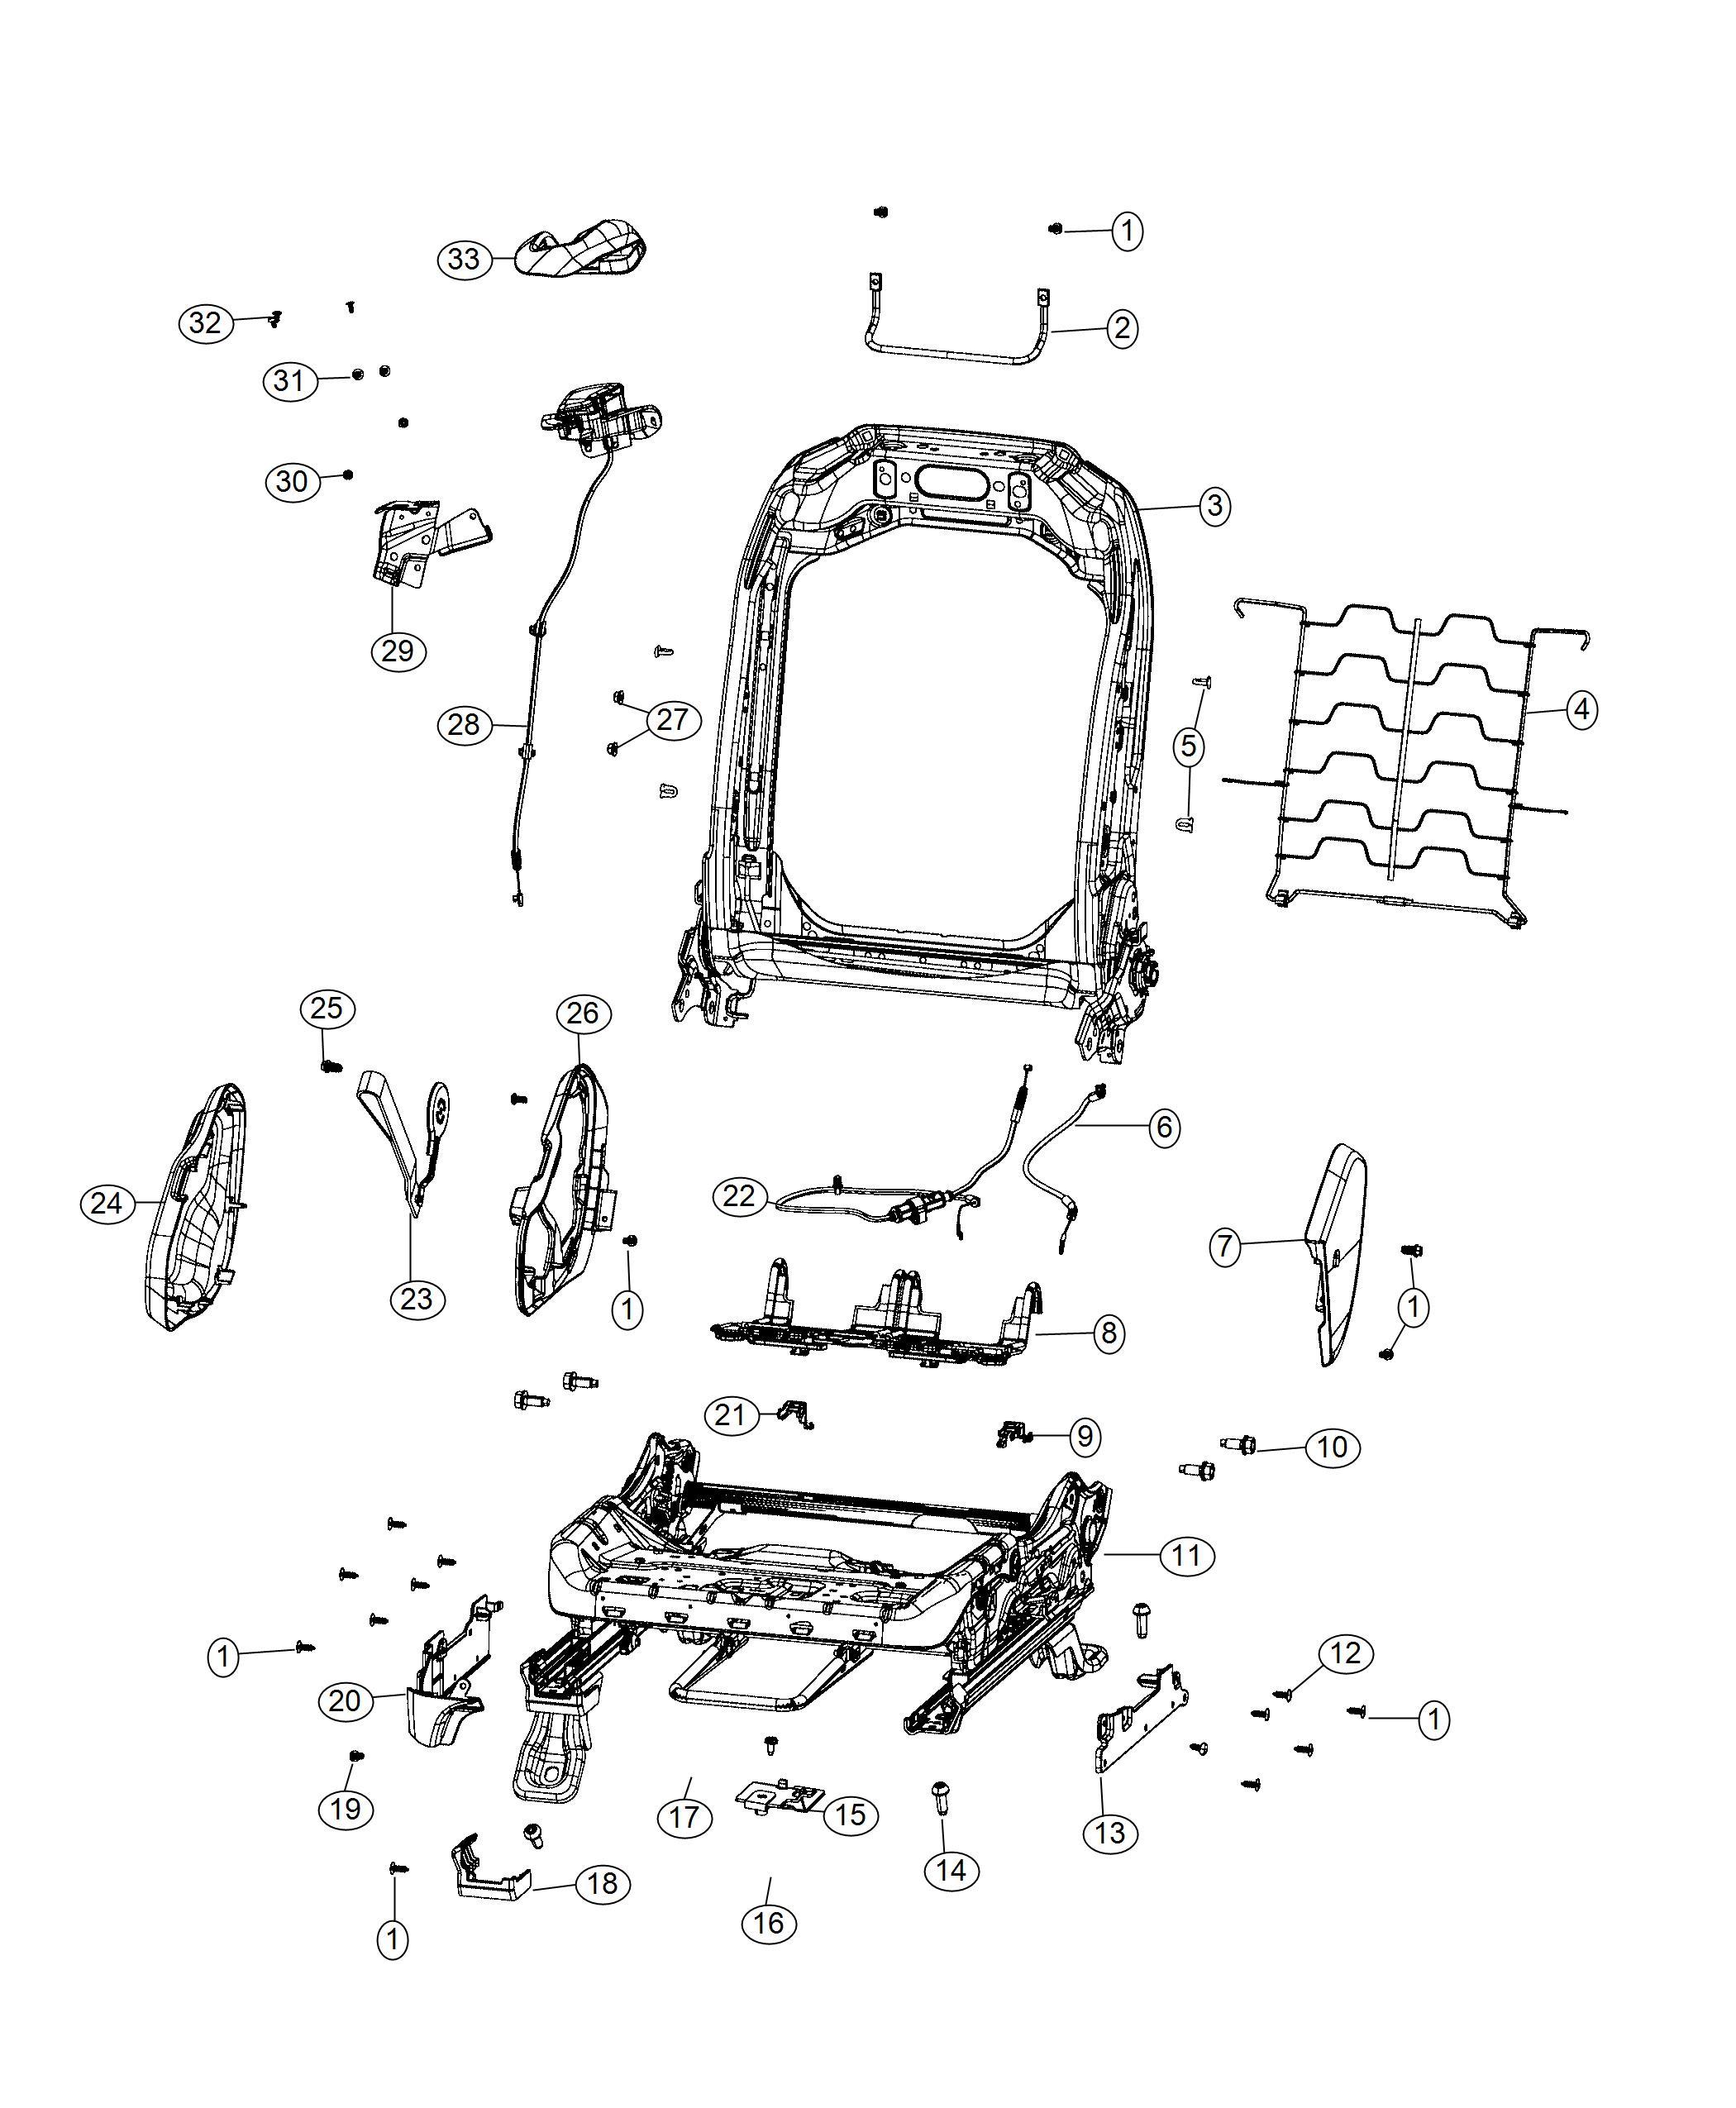 Jeep Wrangler Pull Strap Seat Recliner Export Black